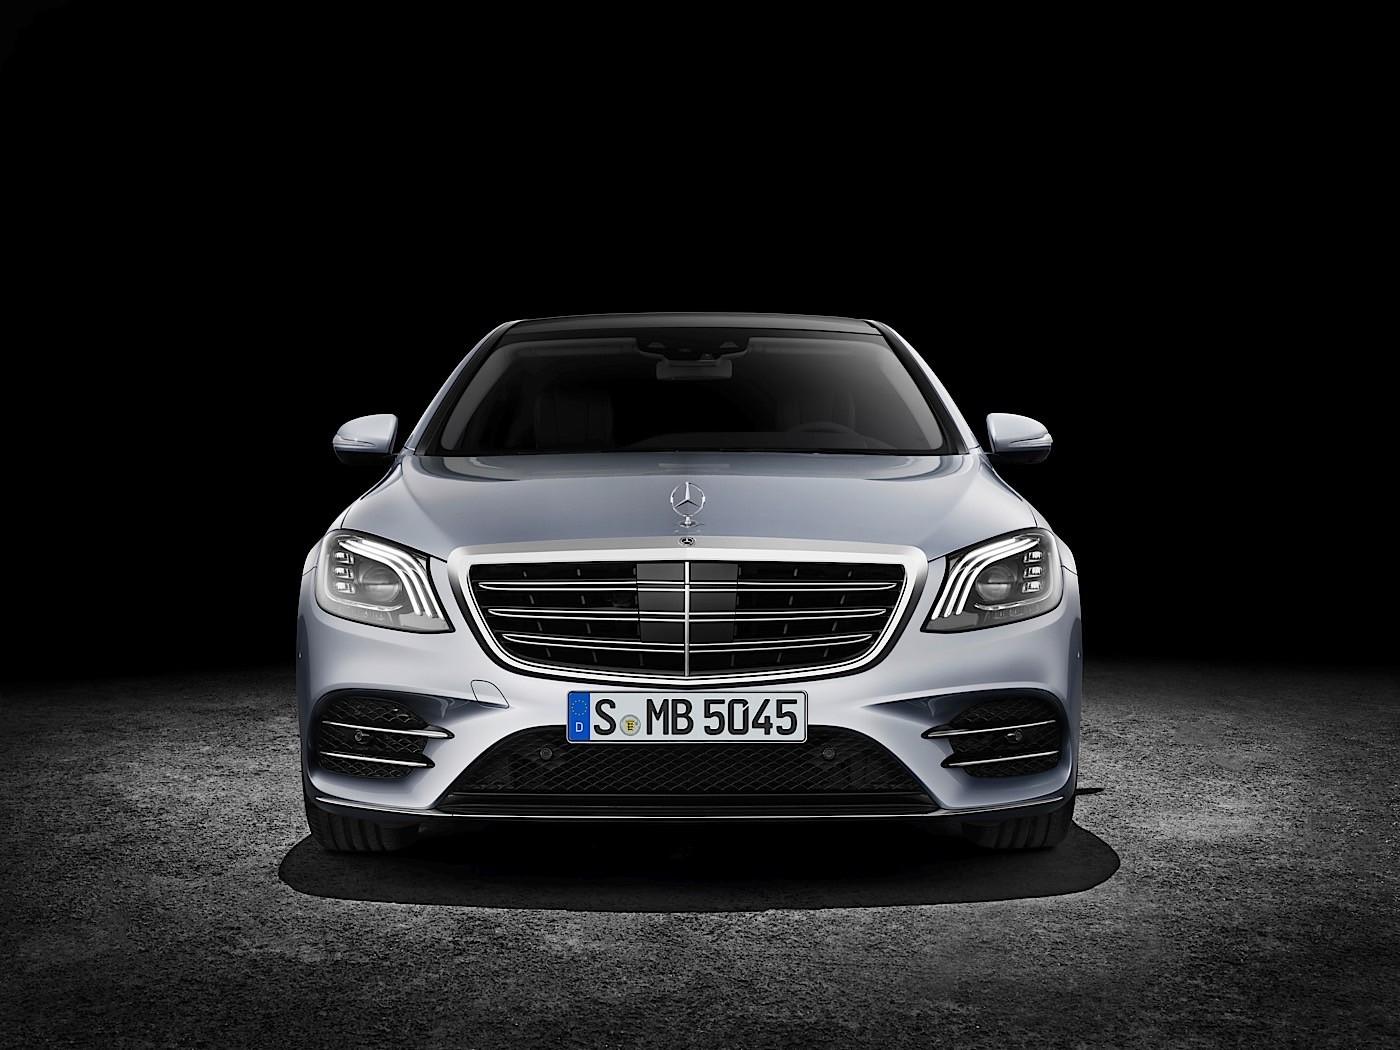 2018 Mercedes-Benz S-Class W222 Facelift Brings Back The Inline-Six - autoevolution